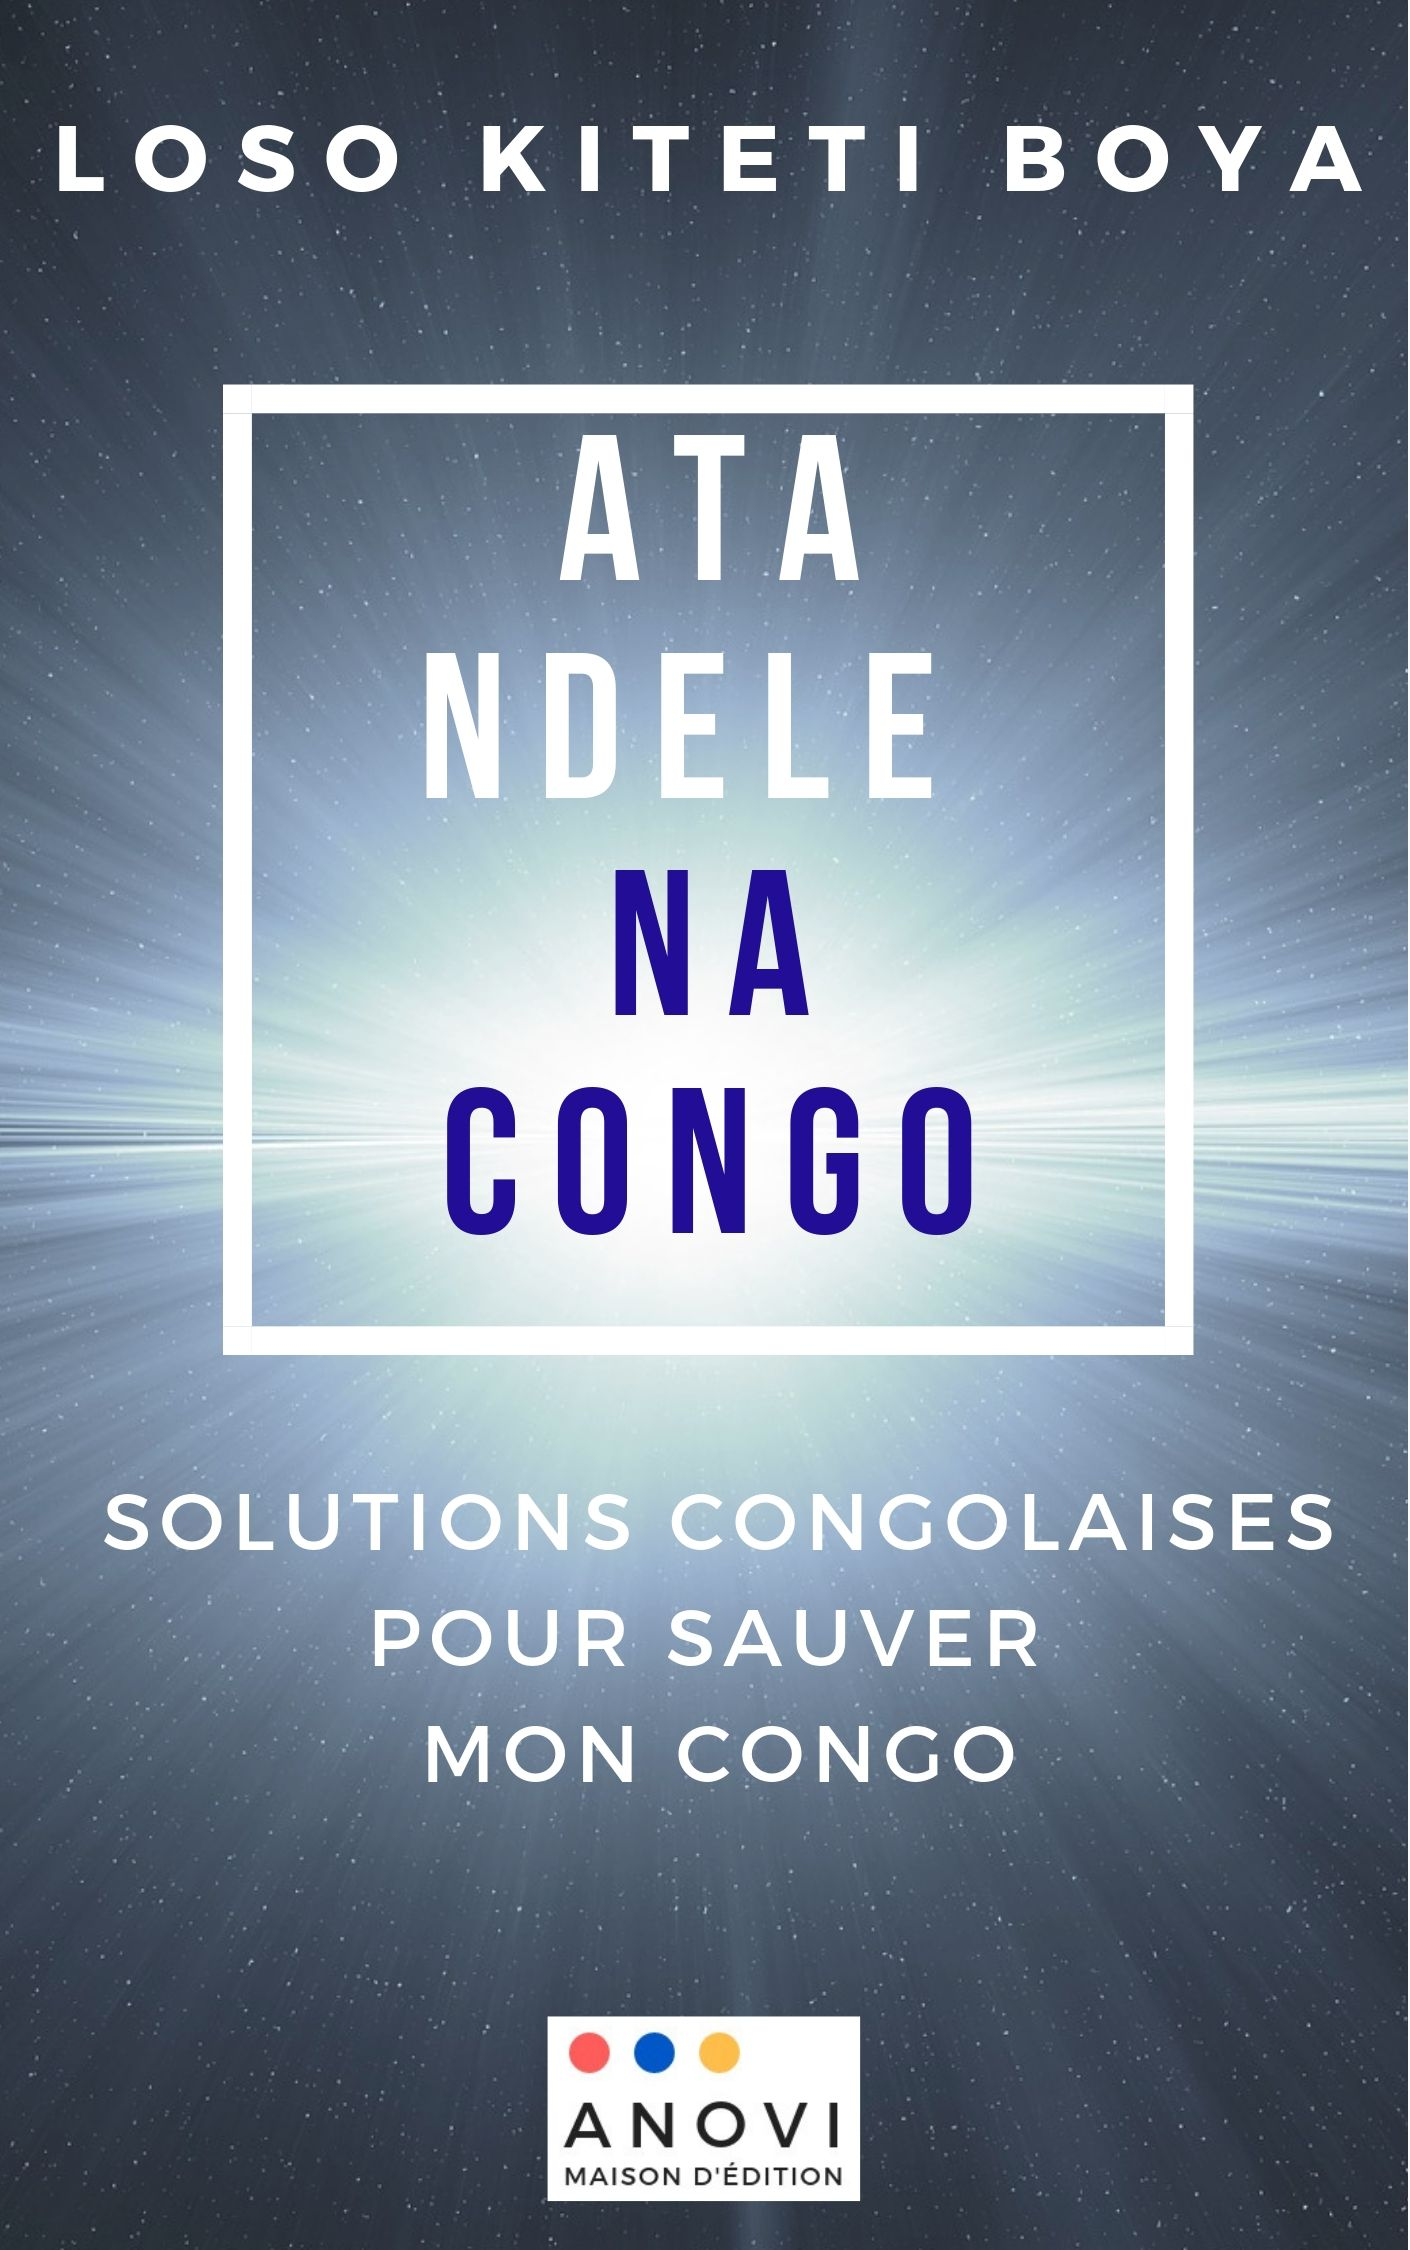 Na Congo : solutions congolaises pour sauver mon Congo Image